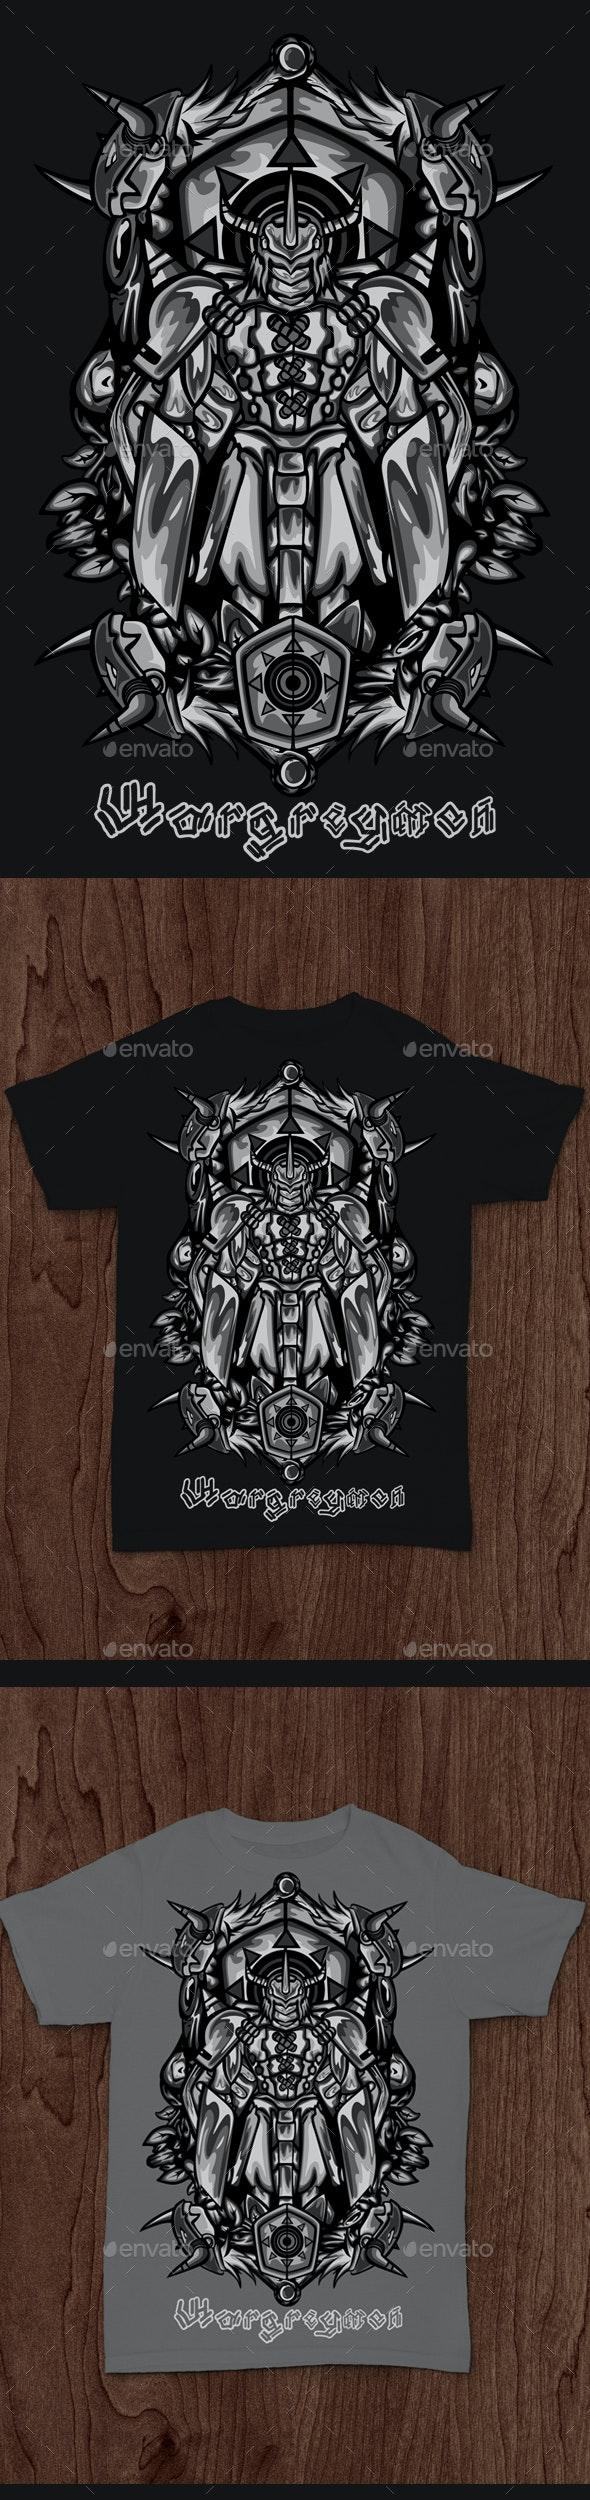 Black Wargreymon - Designs T-Shirts